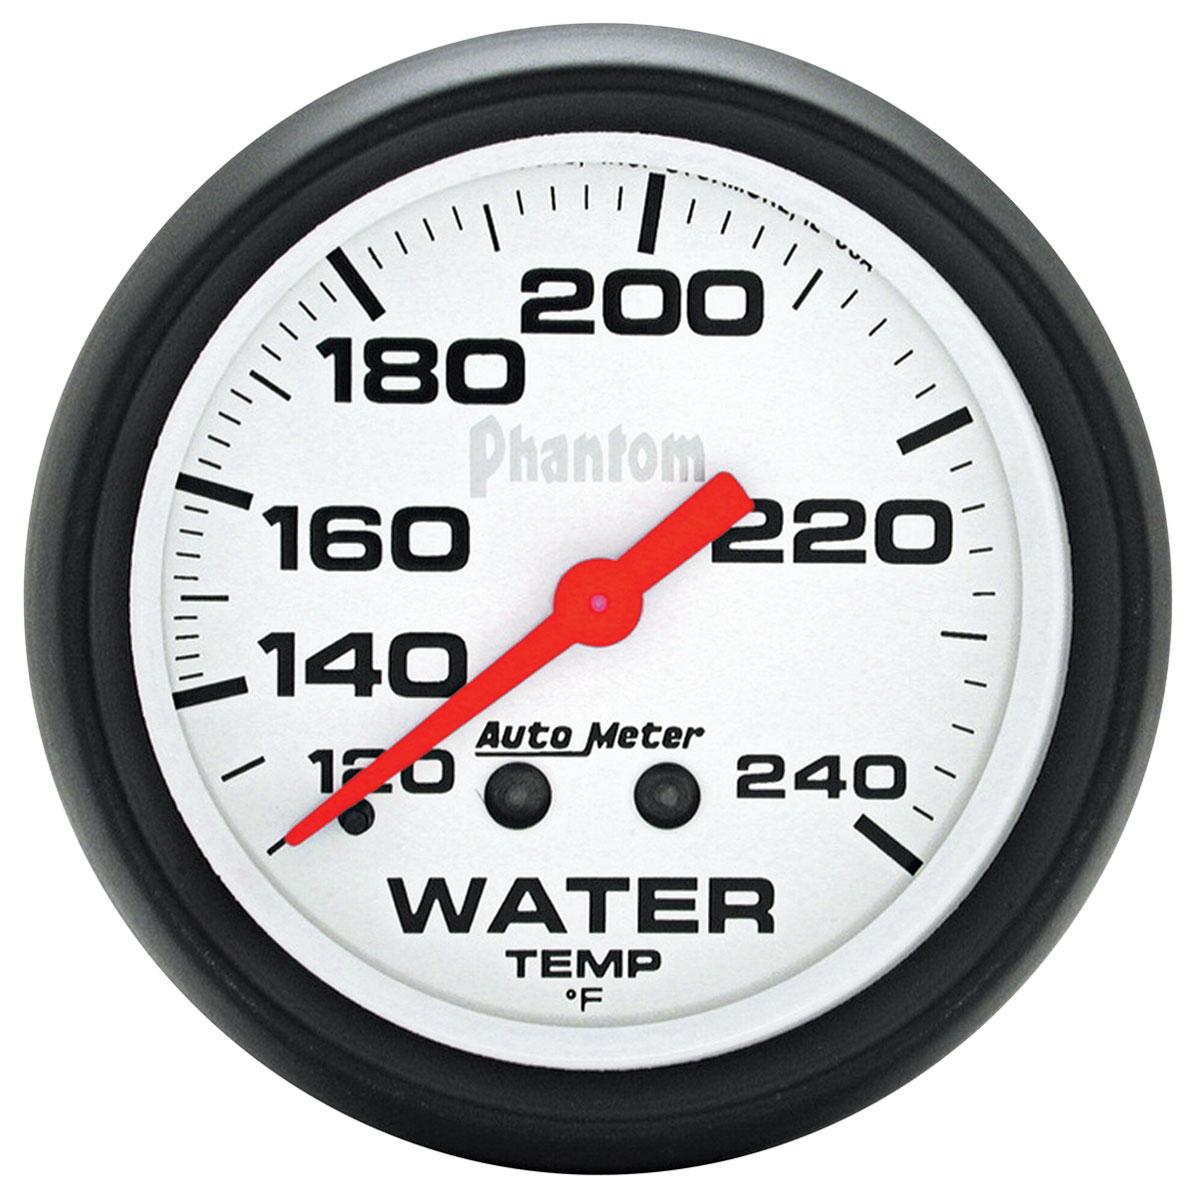 Gauge, Water Temperature, Auto Meter, Phantom, 2-5/8